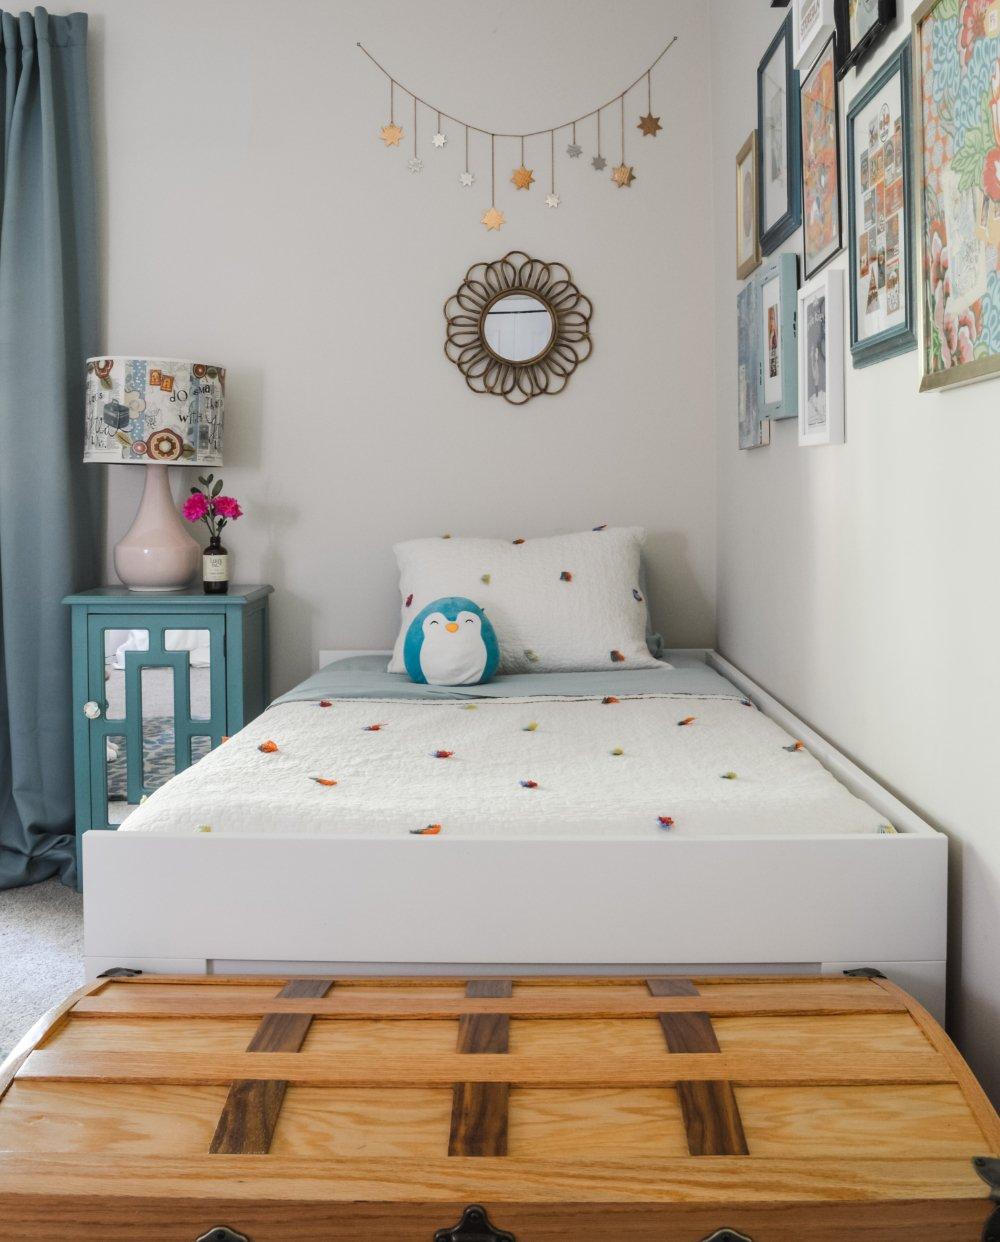 A pretty bedroom designed for a preschool girl